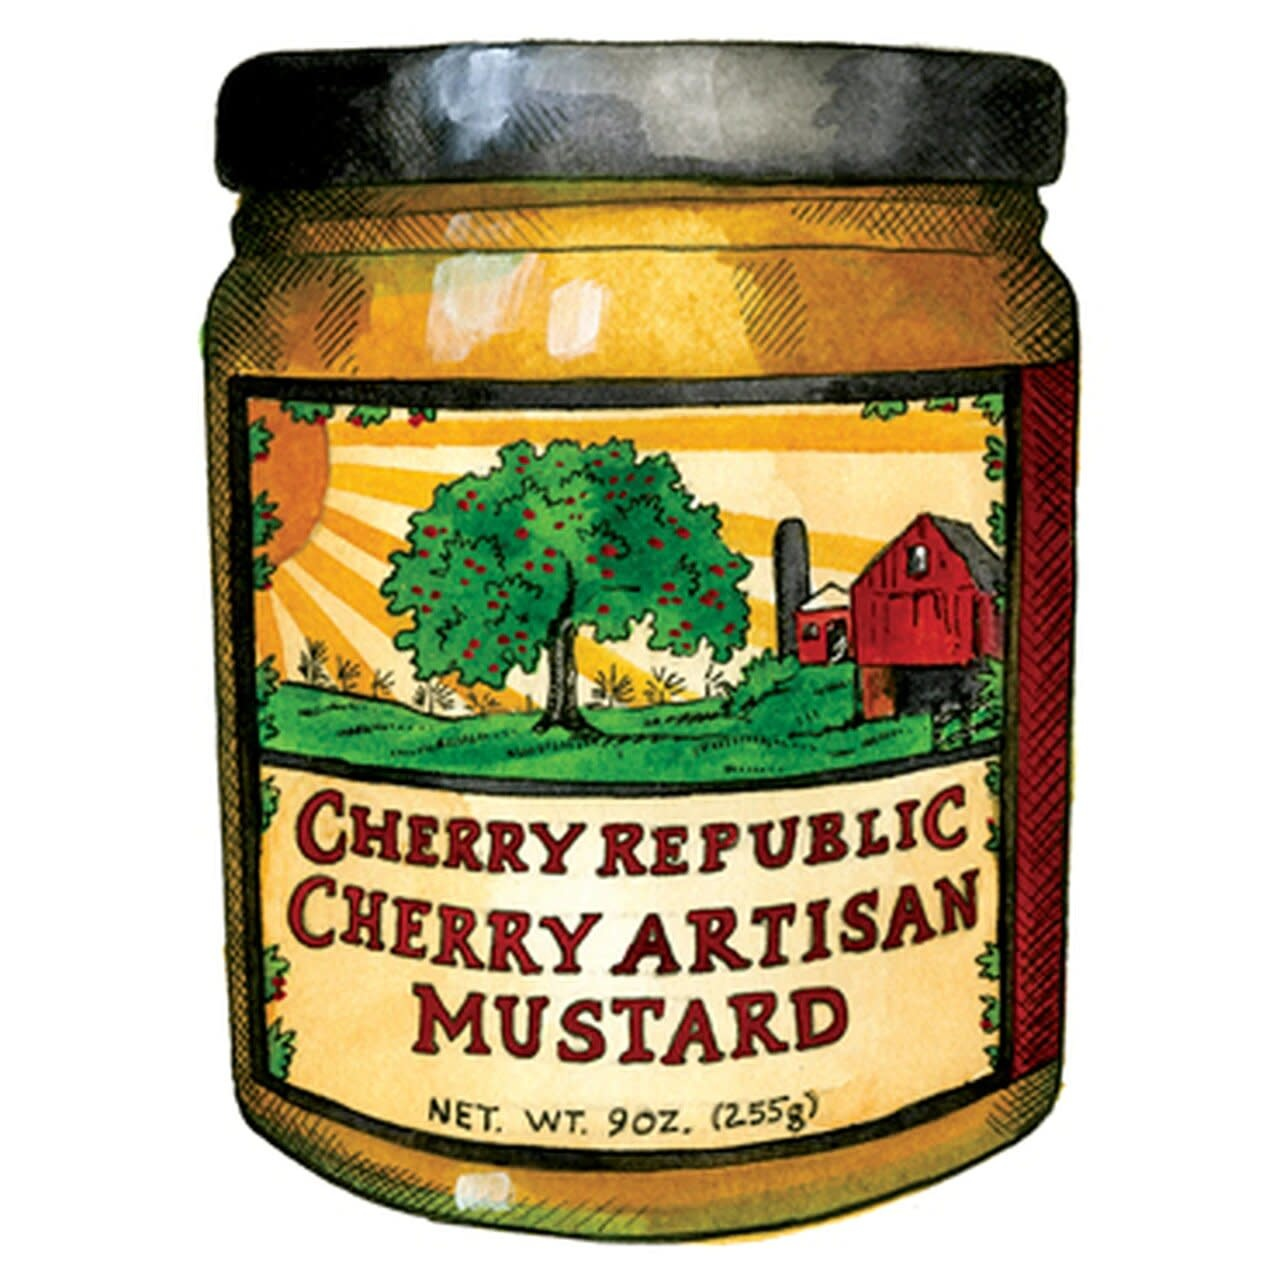 Cherry Republic Cherry Republic Cherry Artisan Mustard 9oz